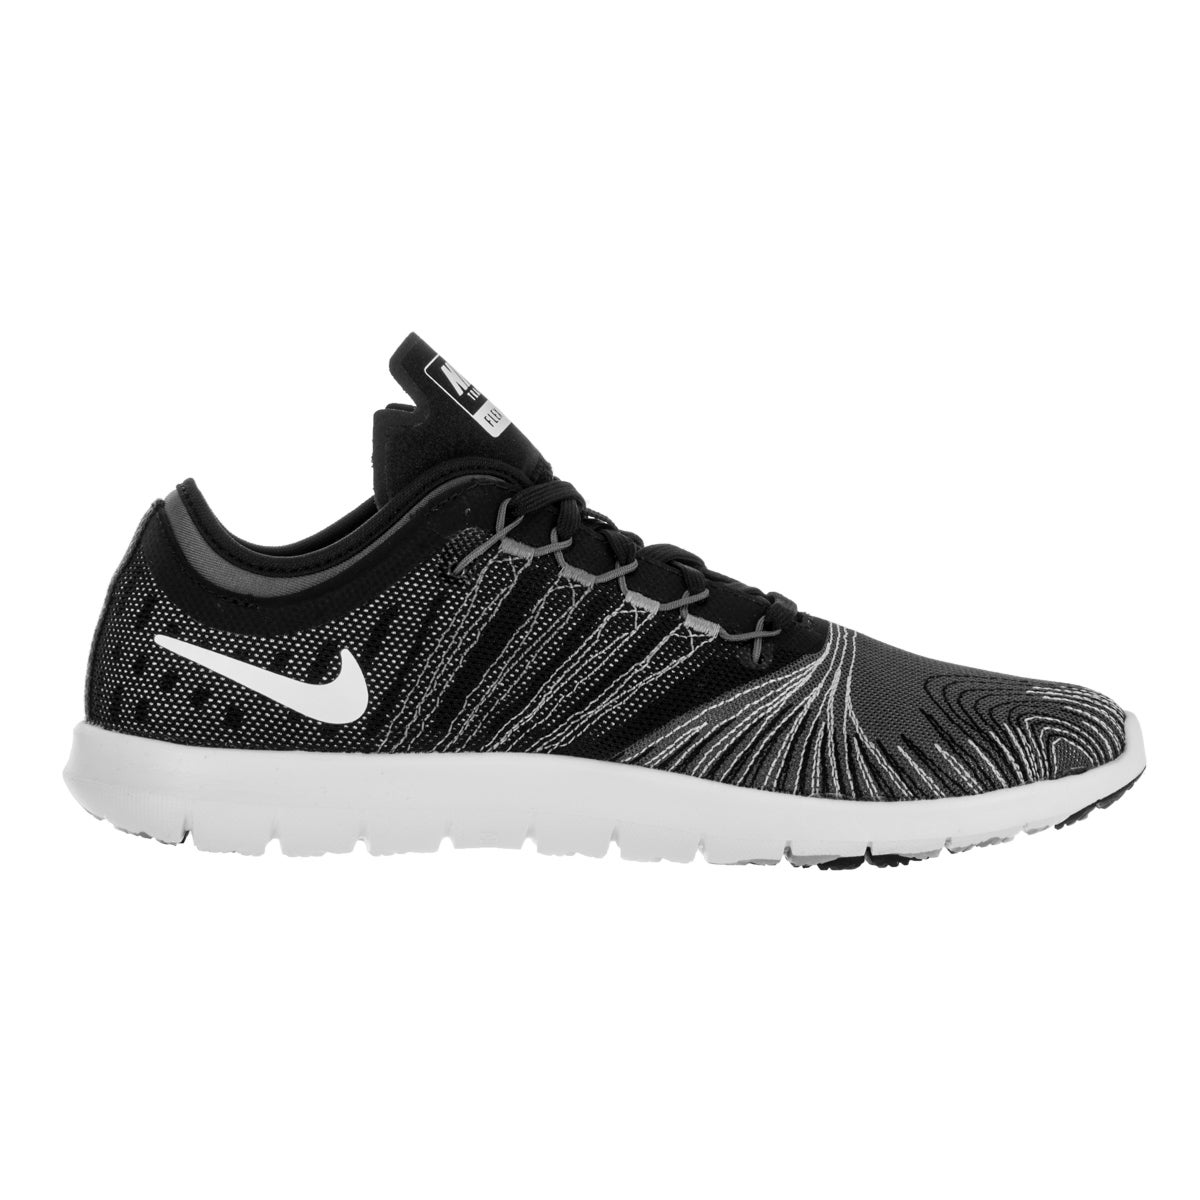 bd26215990c9 Shop Nike Women s Flex Adapt Tr Dark Grey White Black Stealth Training Shoe  - Free Shipping Today - Overstock - 12329237